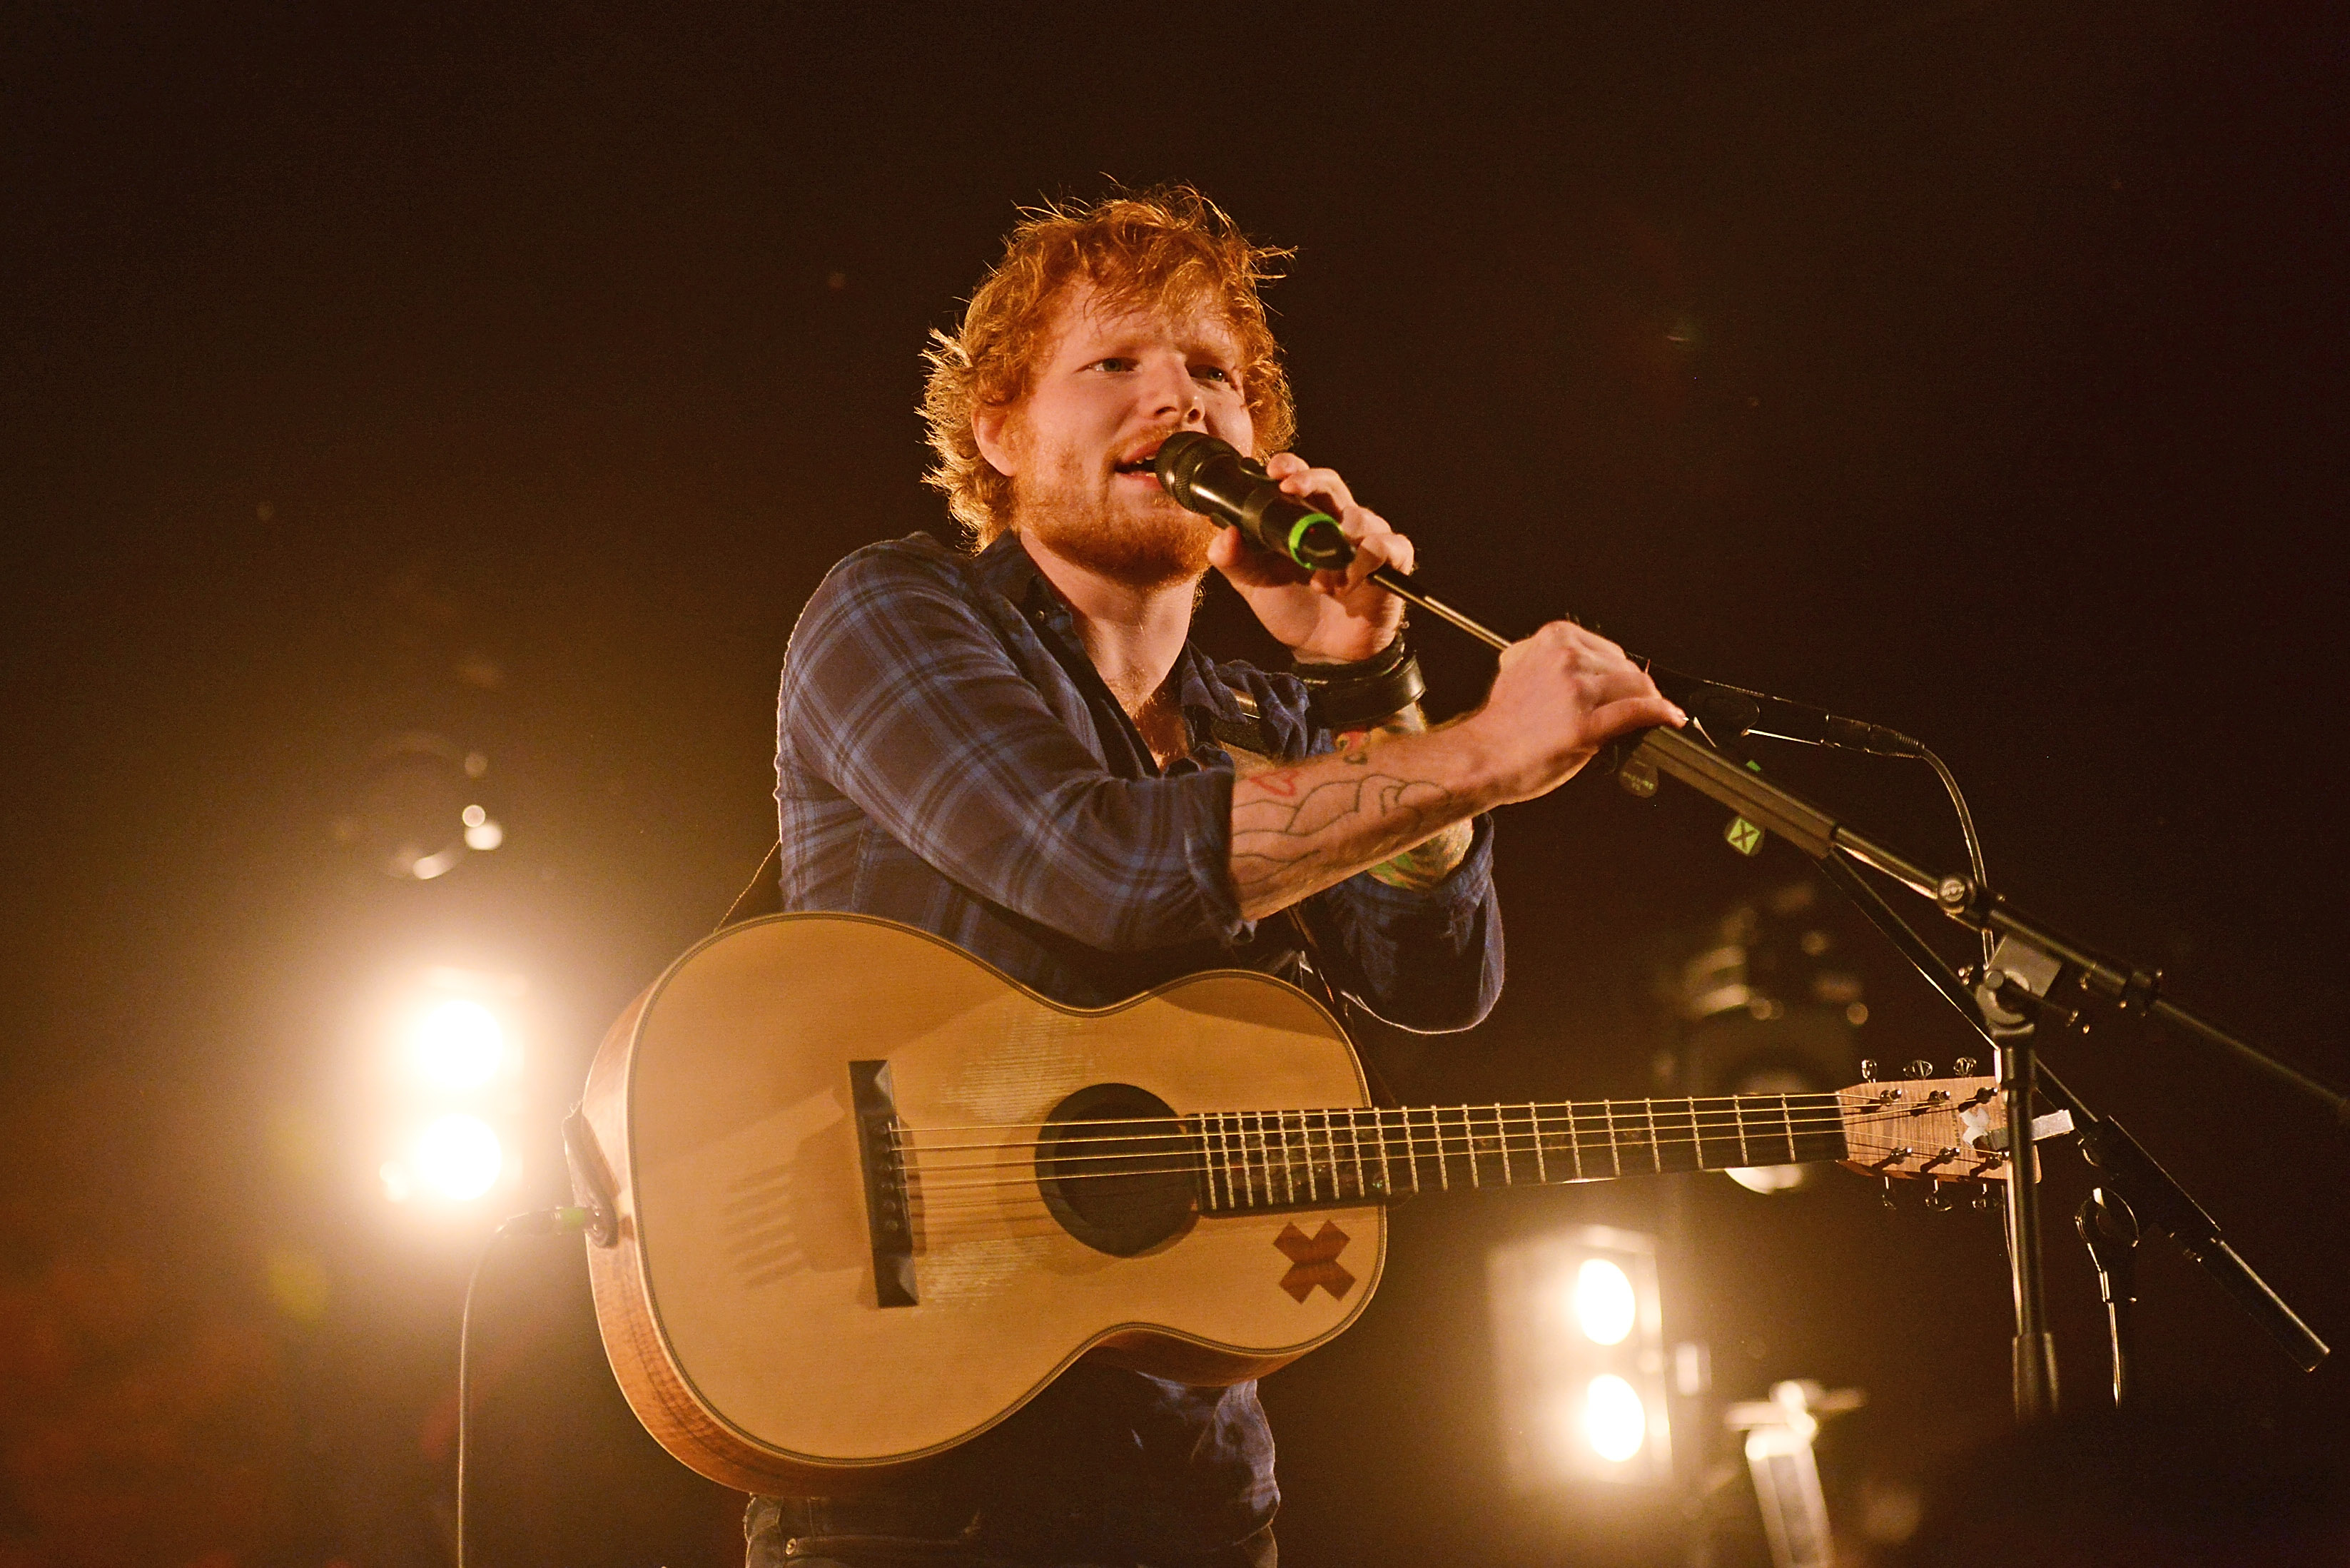 Ed Sheeran Announces 'Live at Wembley Stadium' TV Special